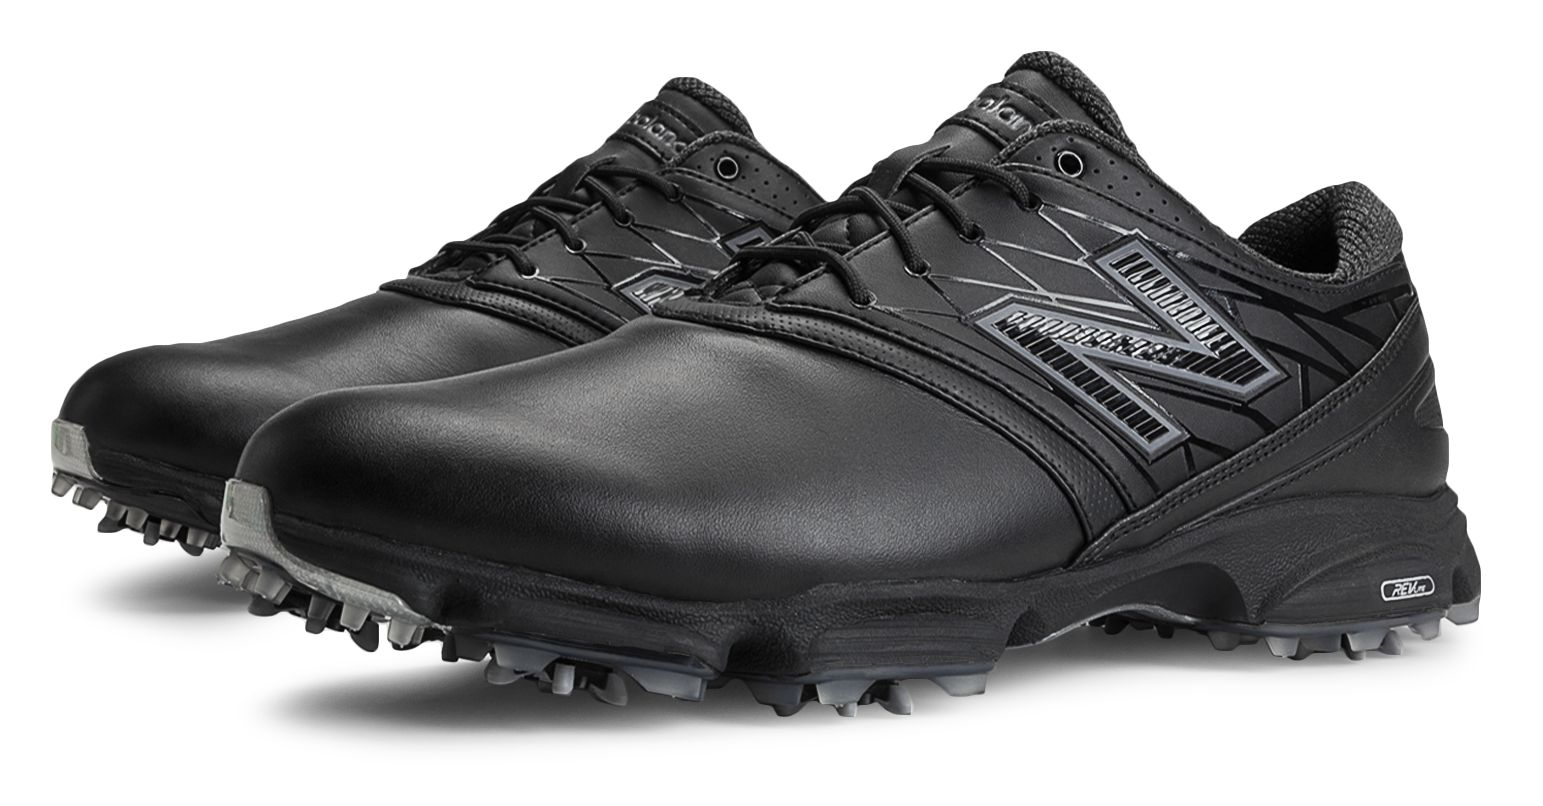 New Balance NBG2001 - Men's - Shoes - Black